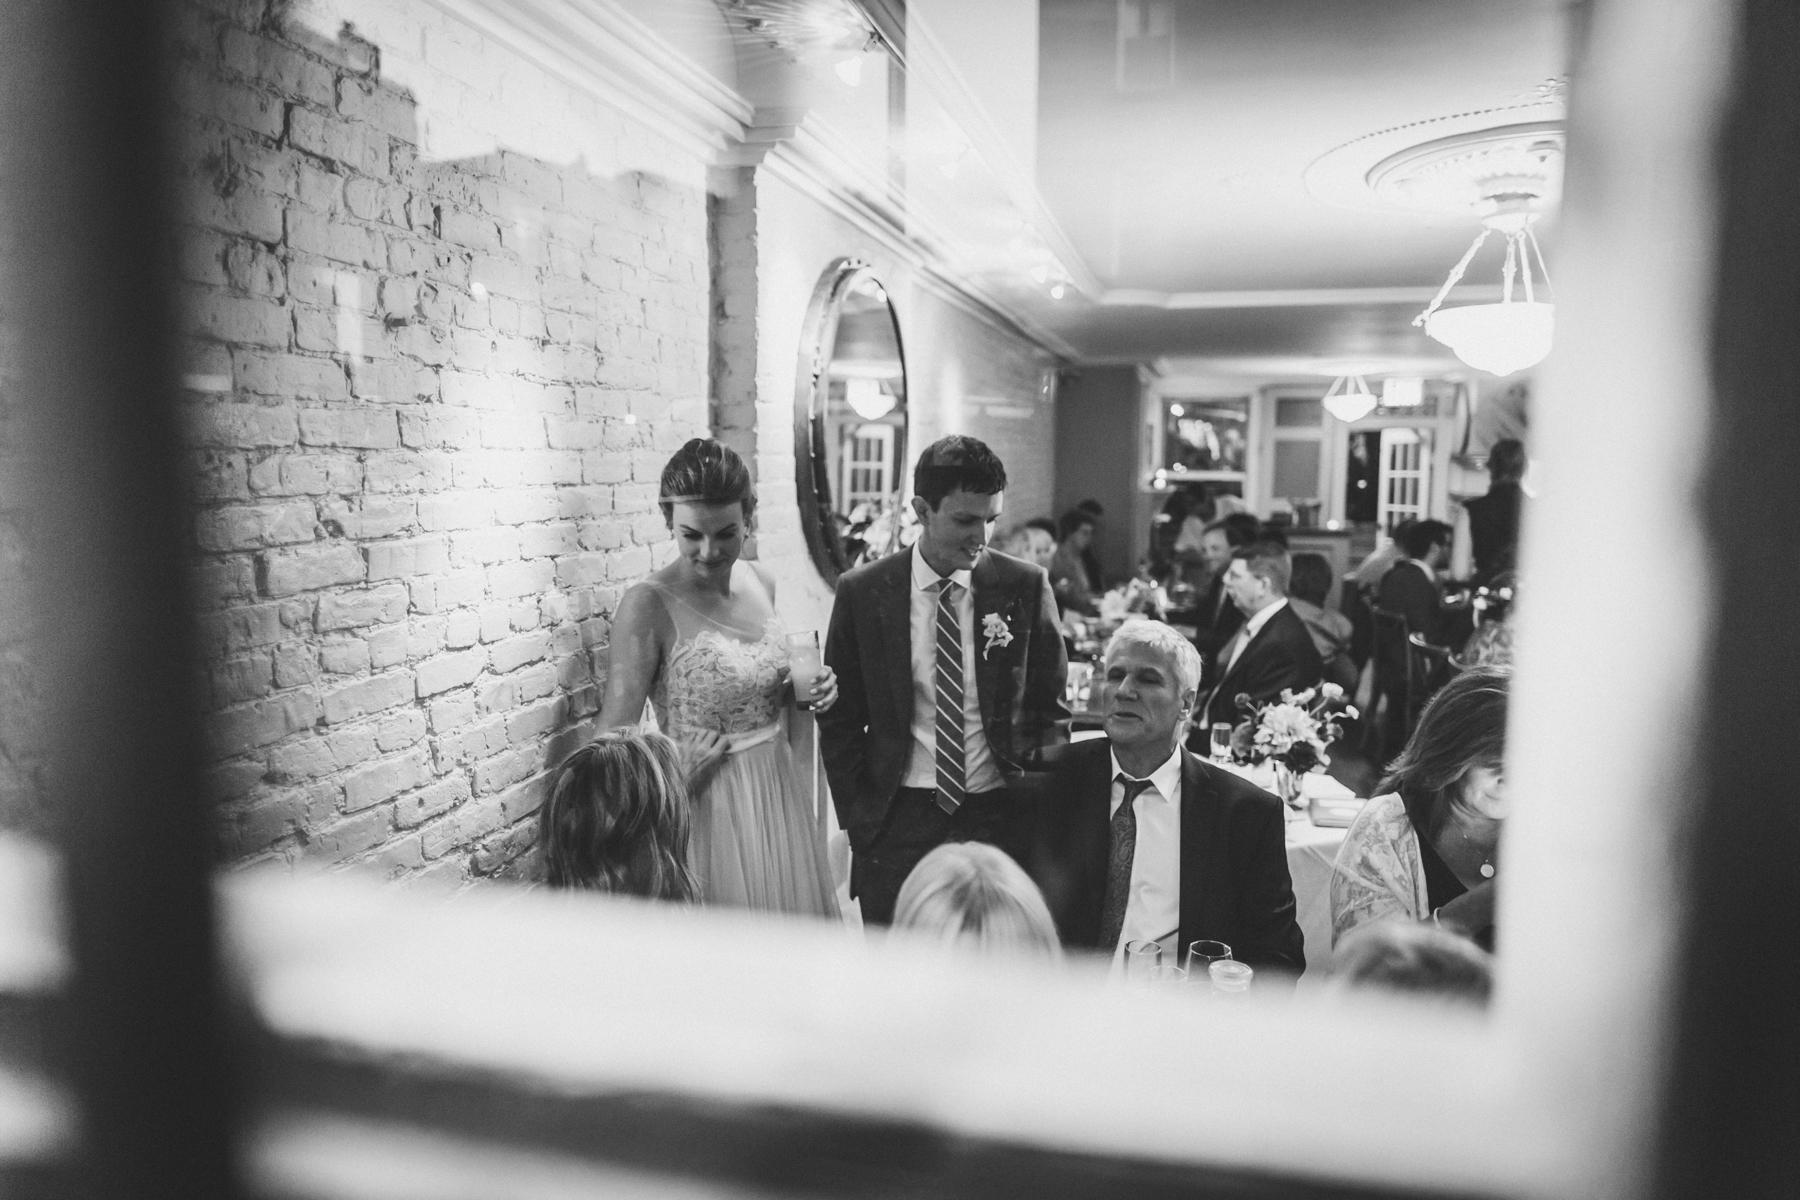 ICI-Restaurant-Fort-Greene-Brooklyn-Intimate-Documentary-Wedding-Photography-Elvira-Kalviste-87.jpg